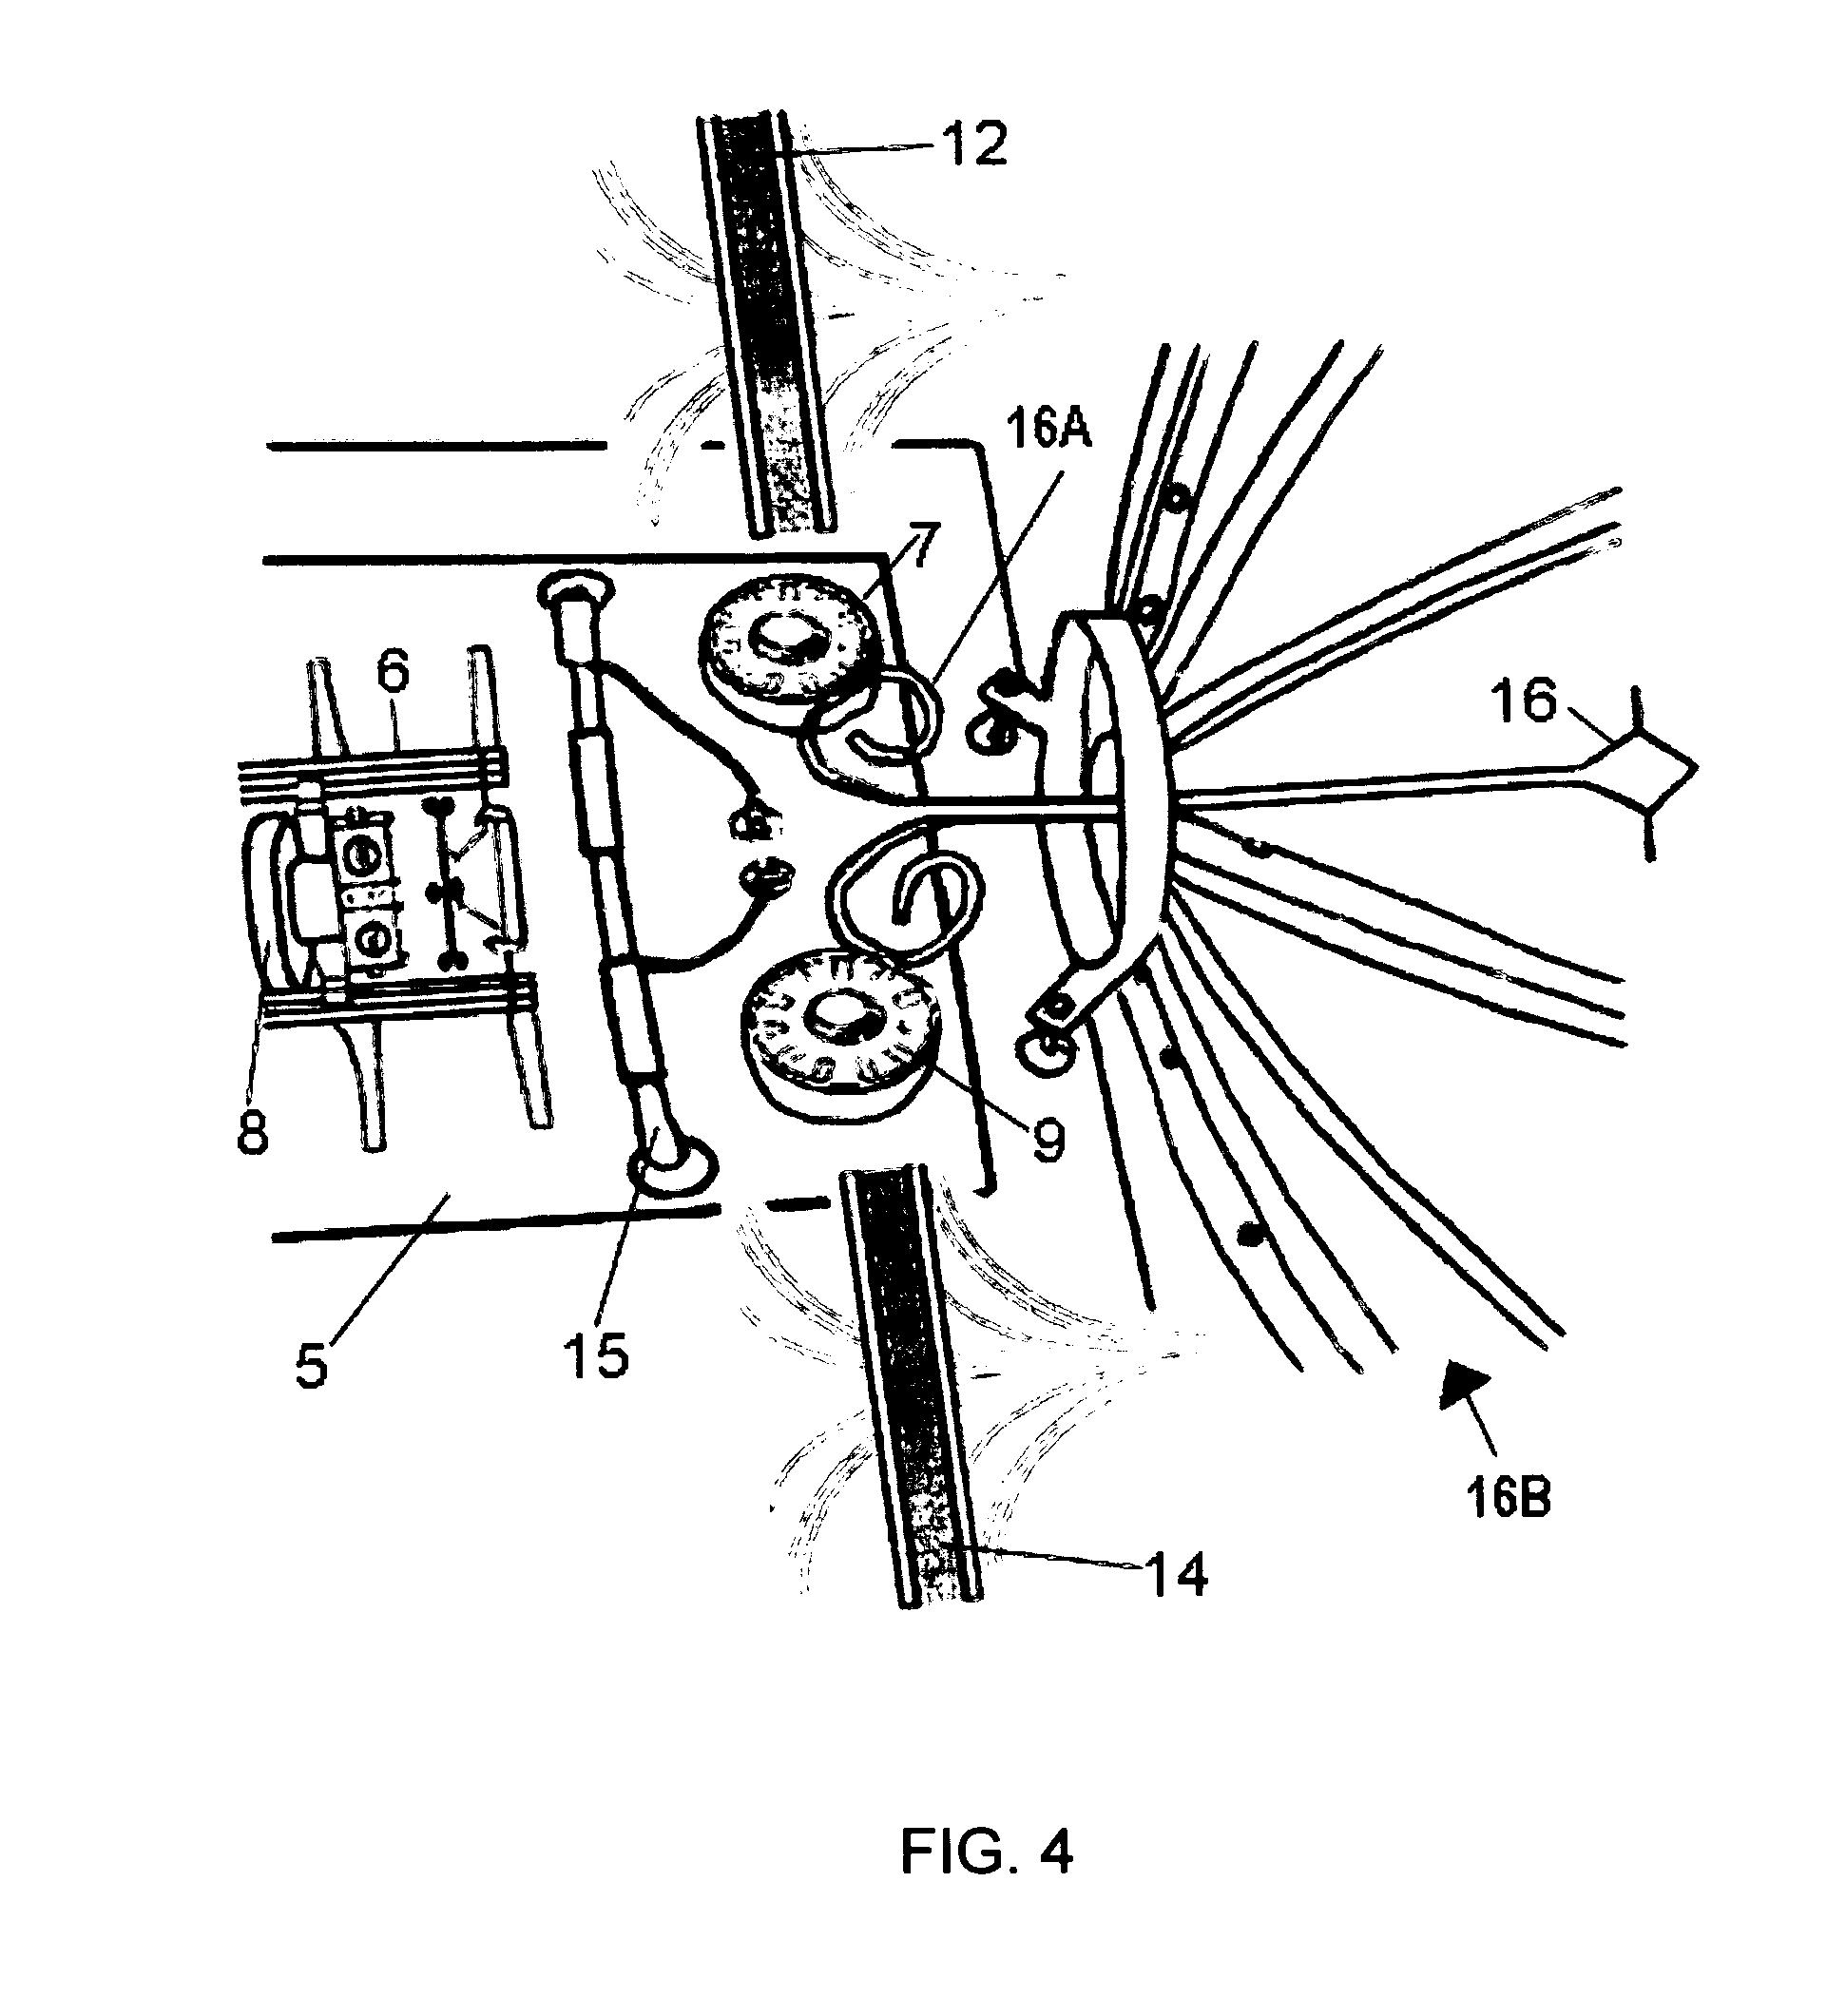 vortex flow meter wiring diagram building a koi pond intrepid headlight assembly